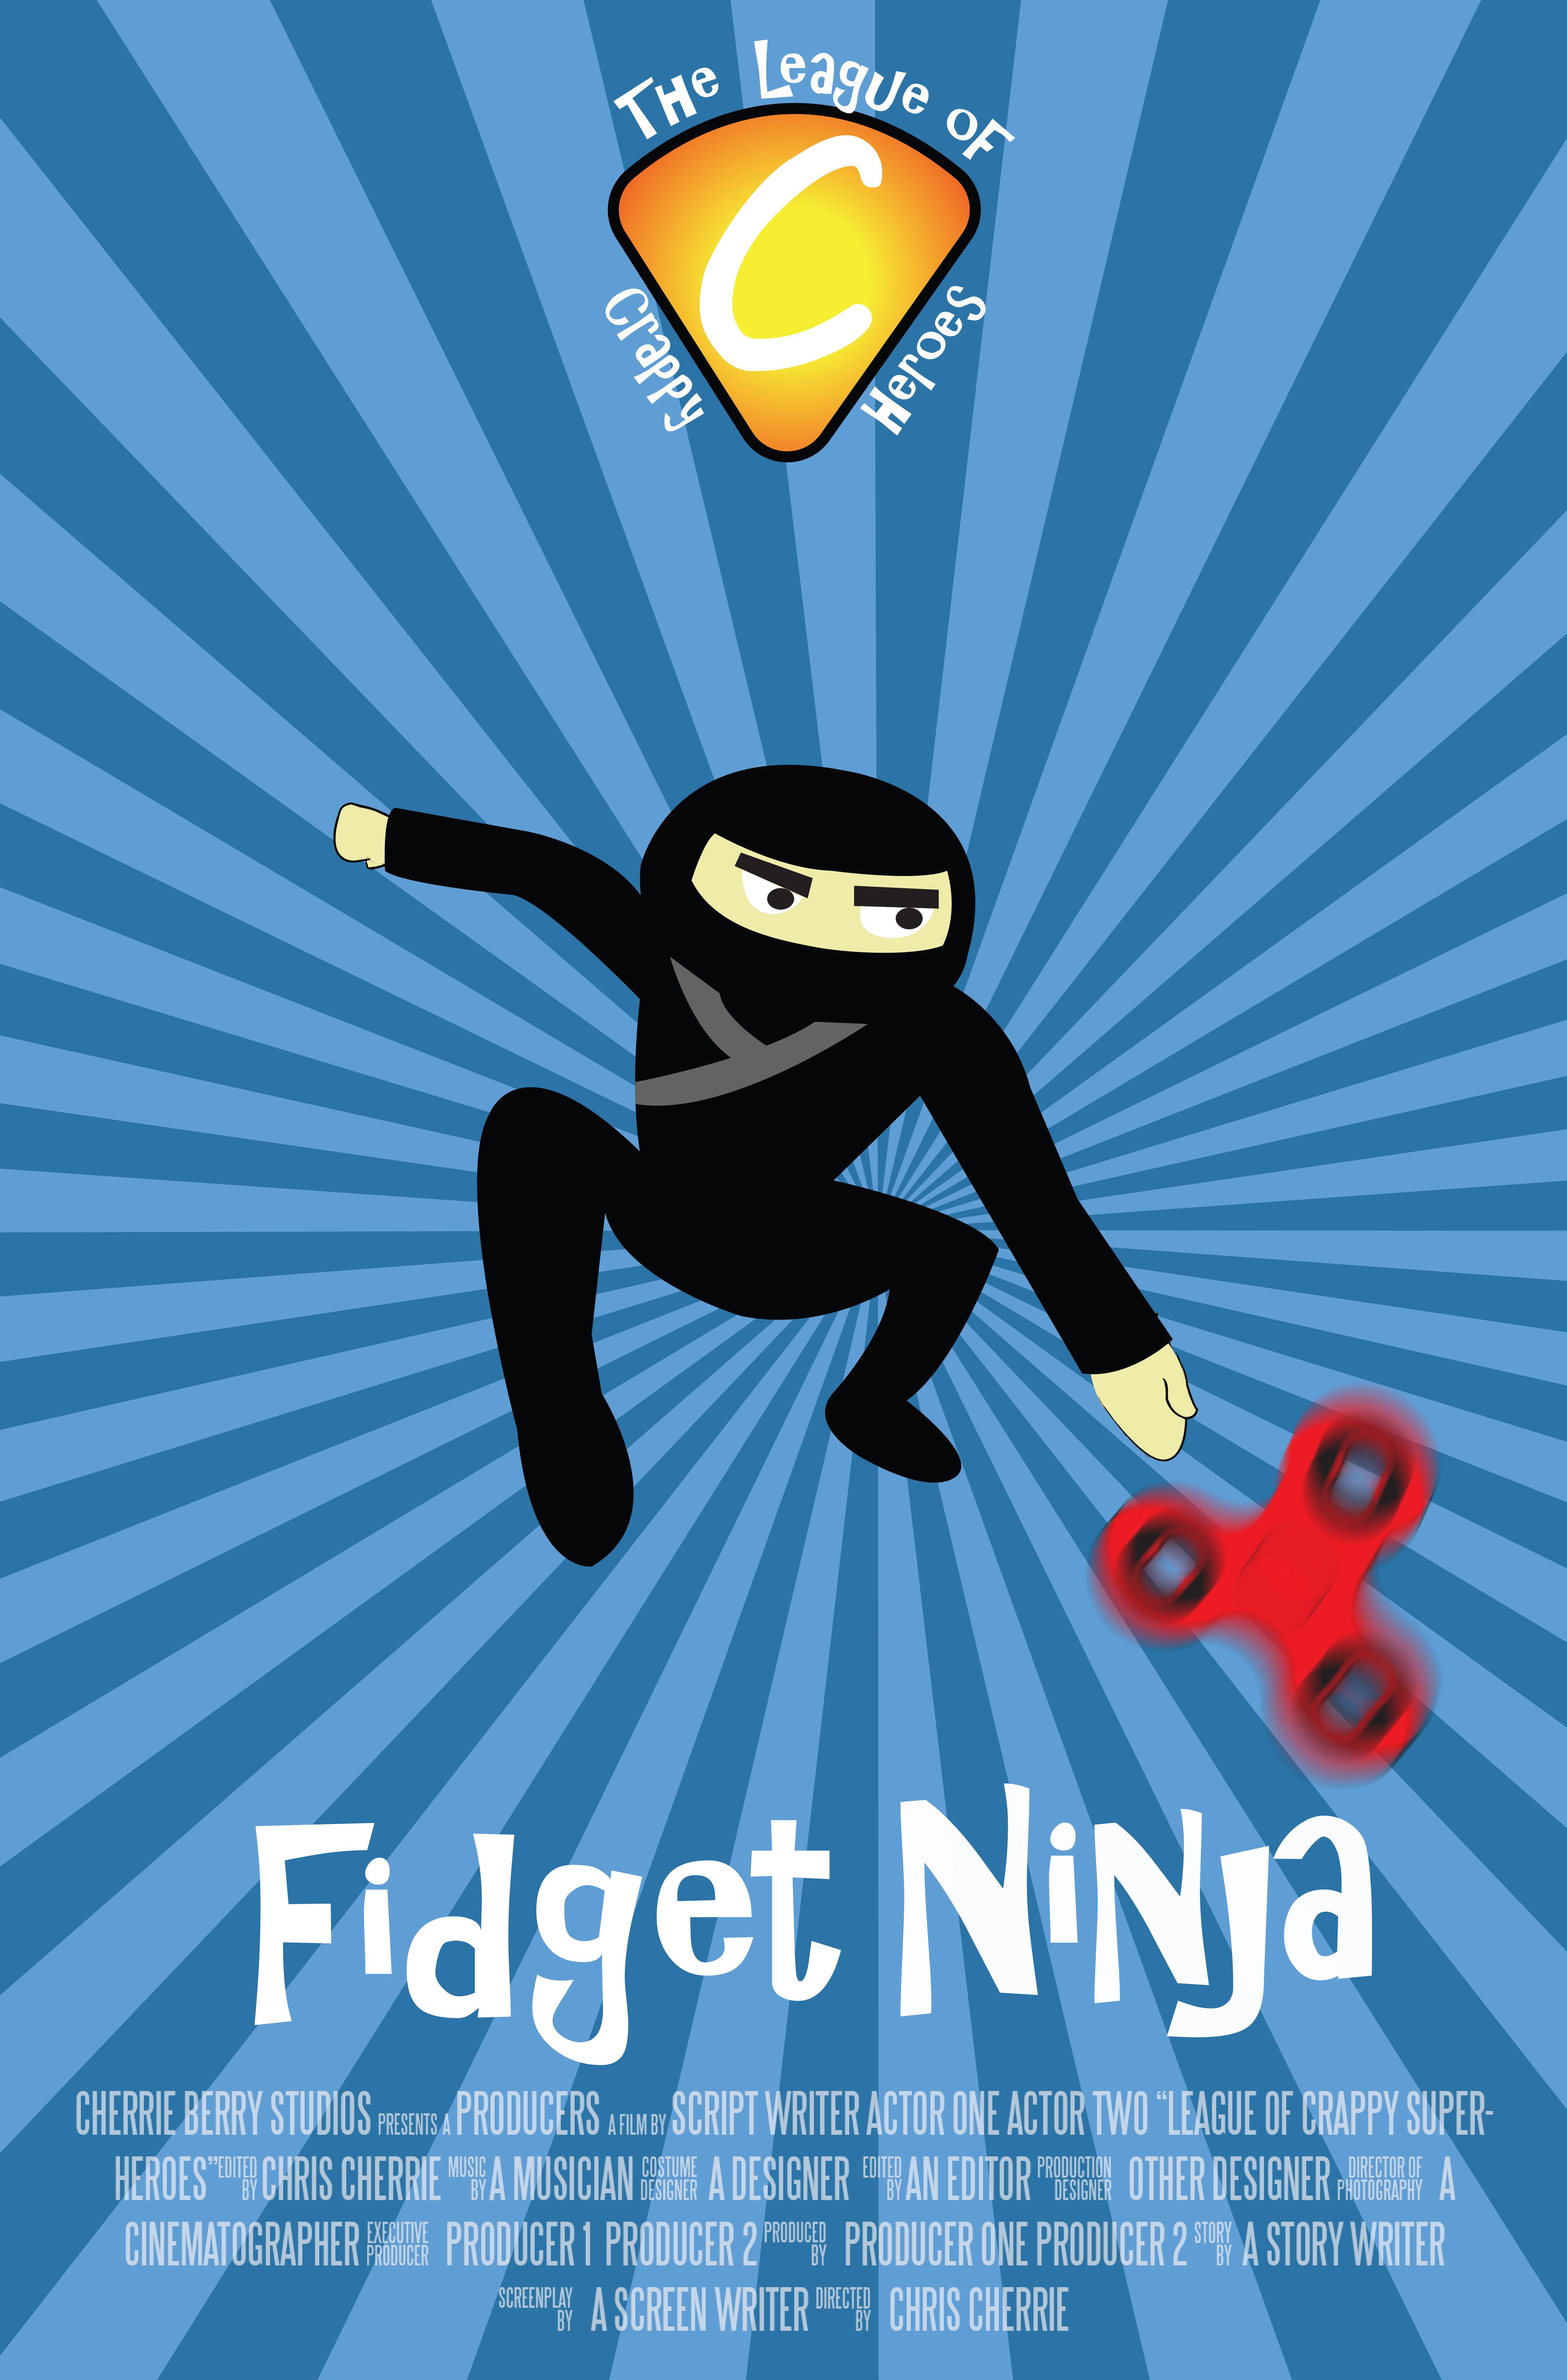 crappyheroes_ninja2